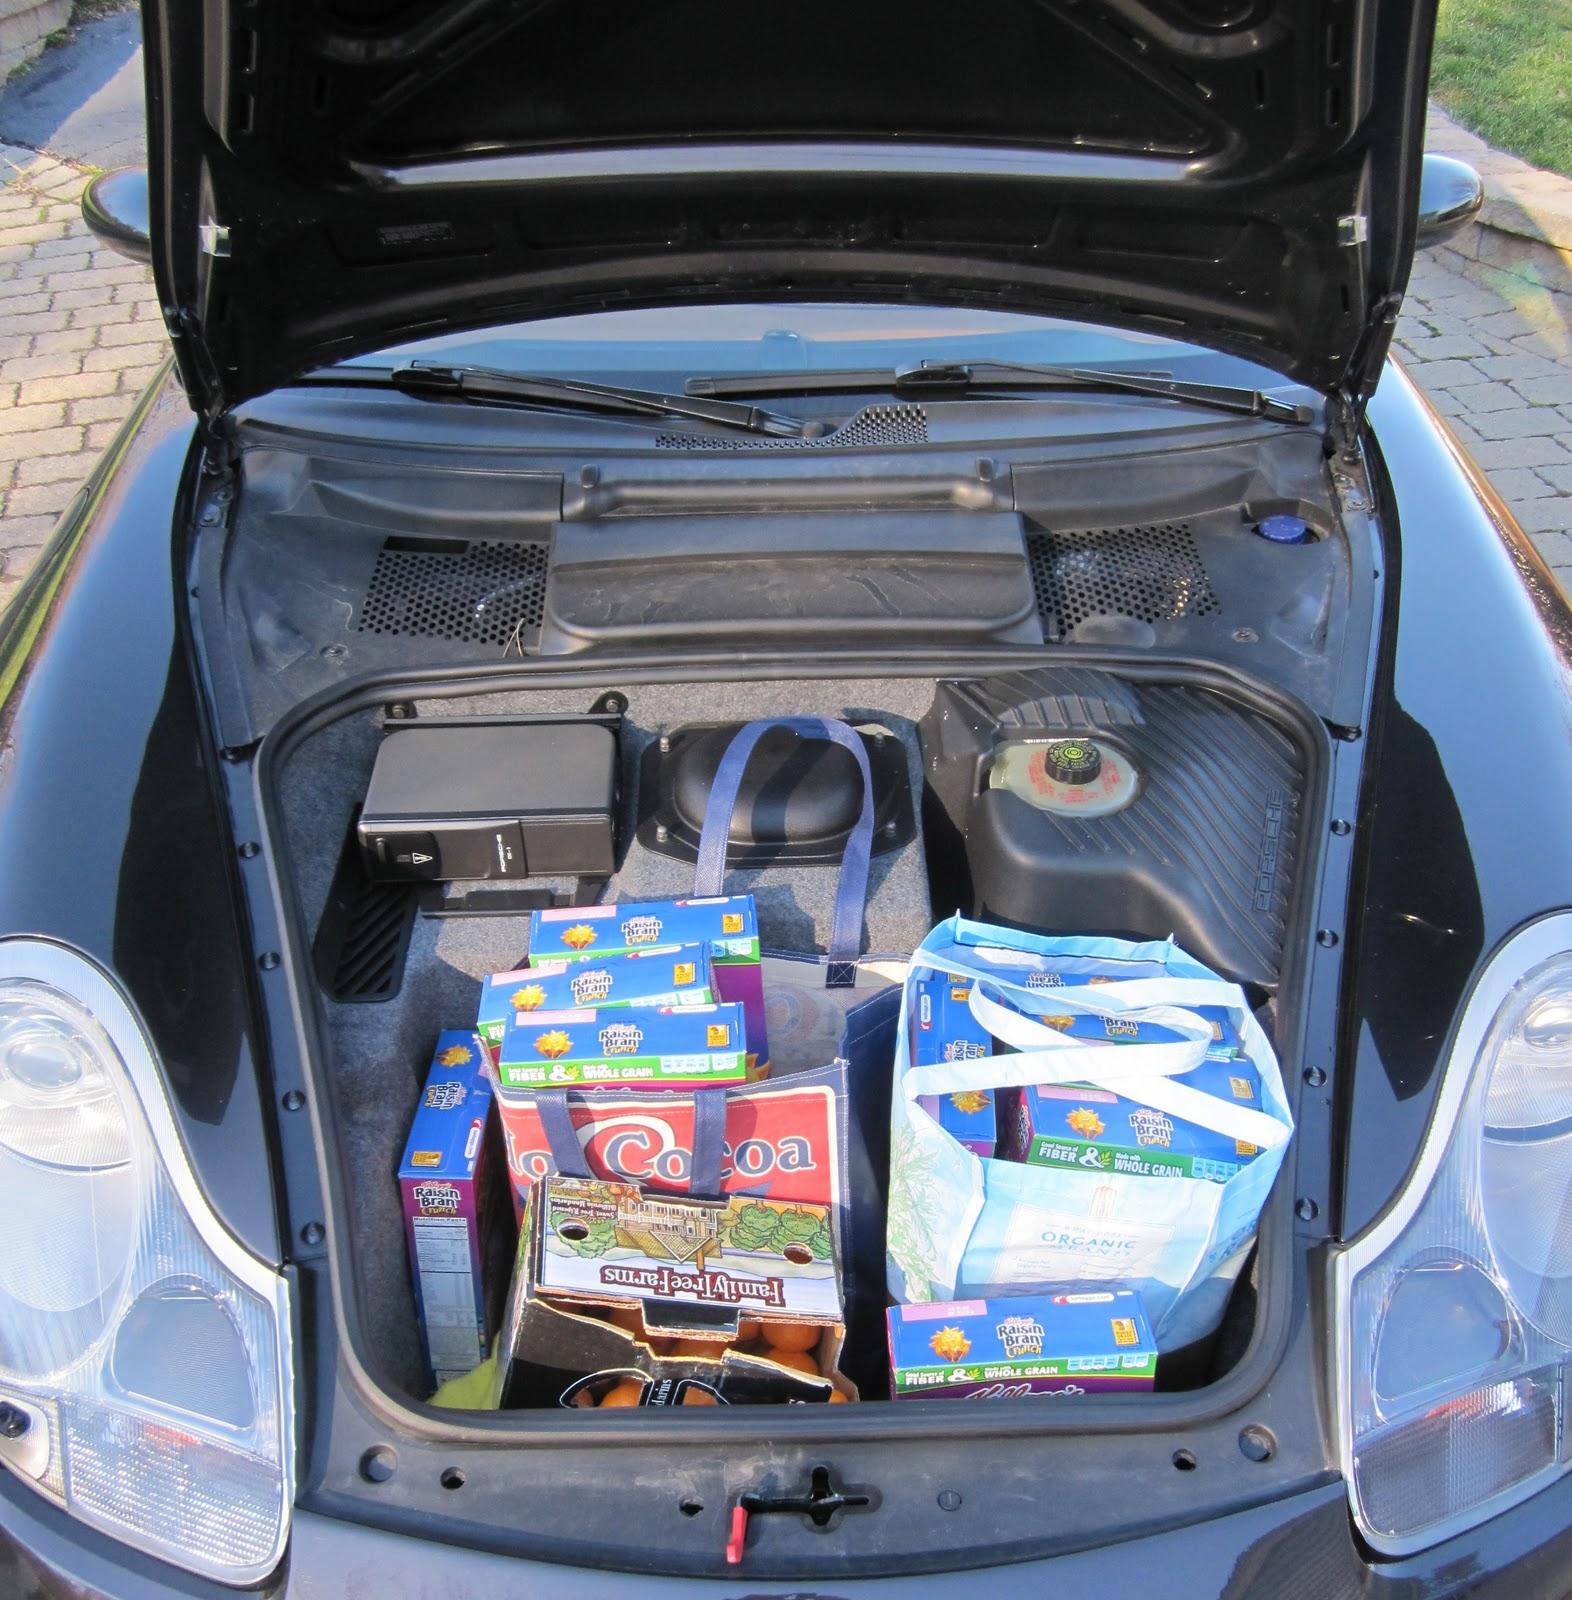 Porsche 911 Engine Weight: One Hot Lap: January 2012